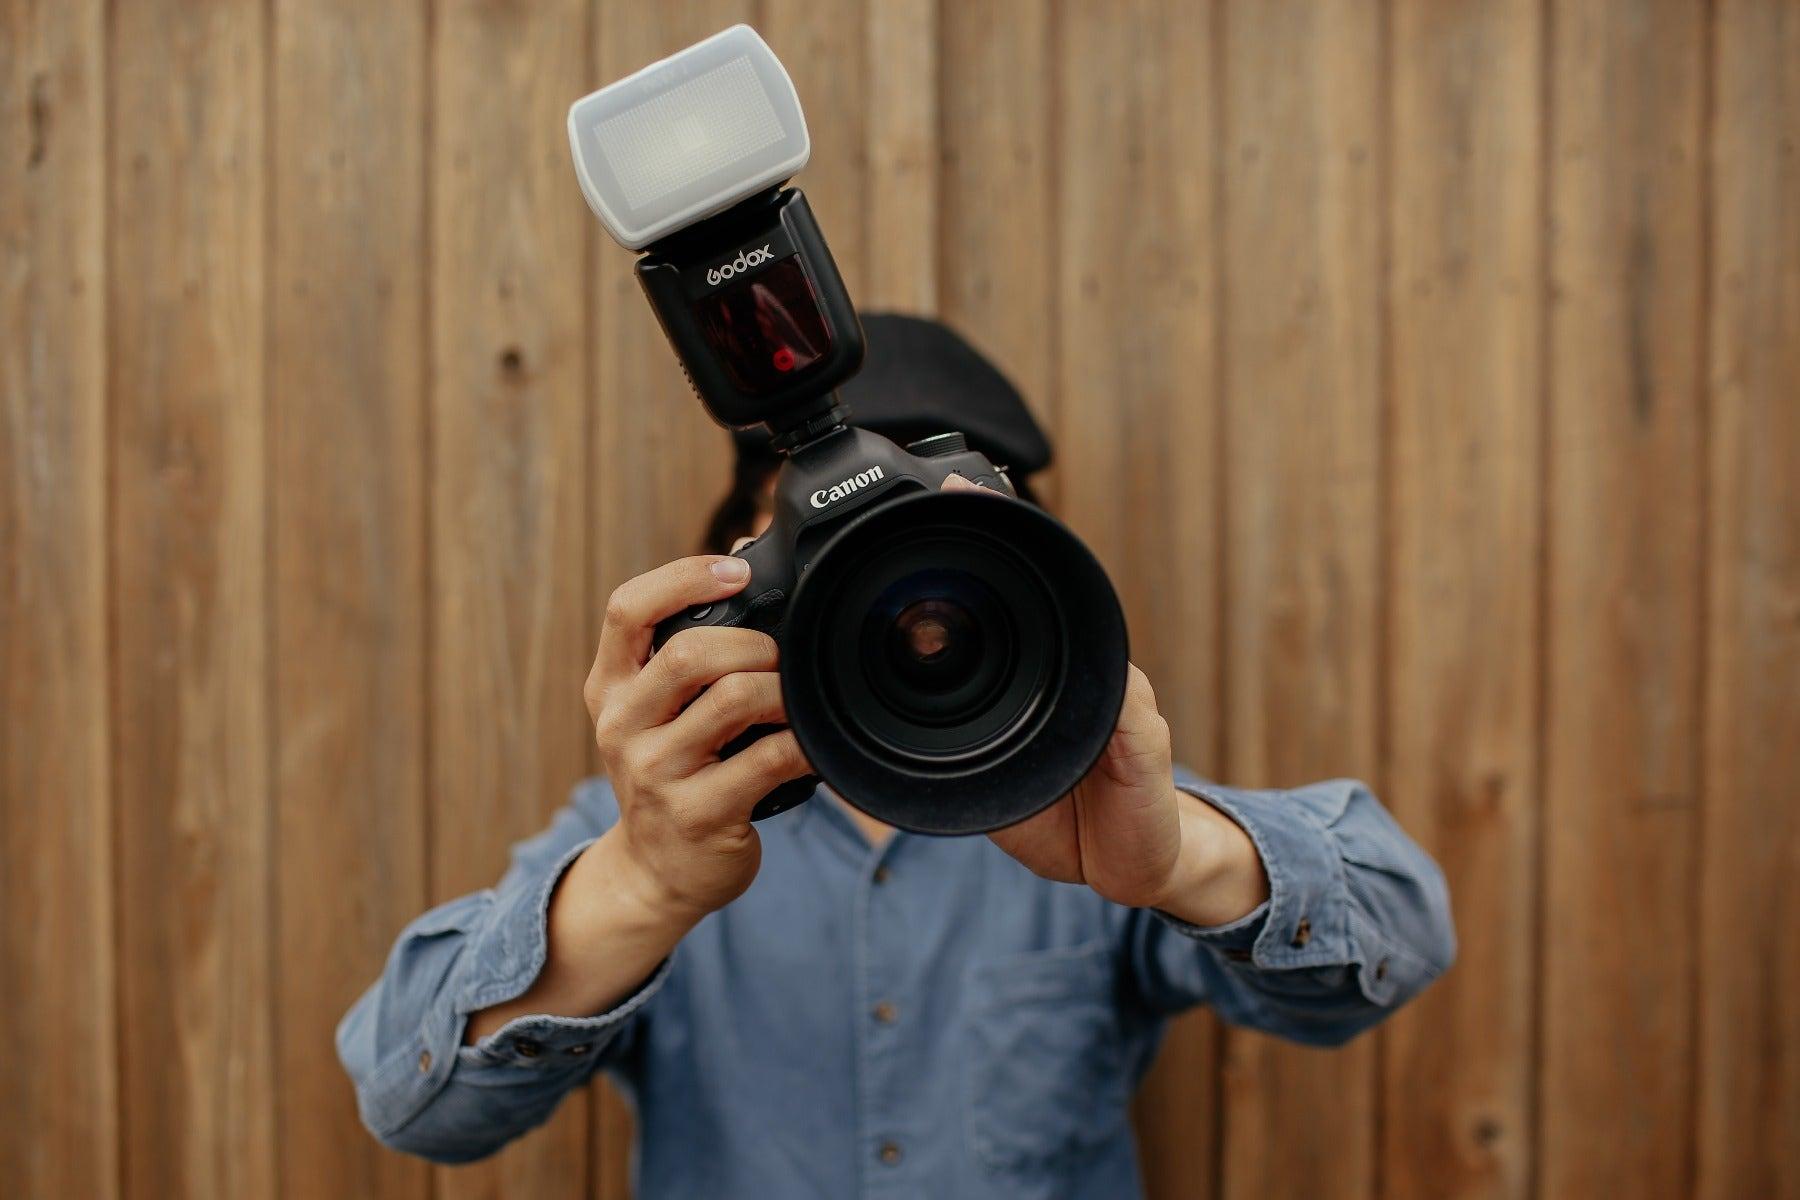 Man using Godox flash on a Canon camera